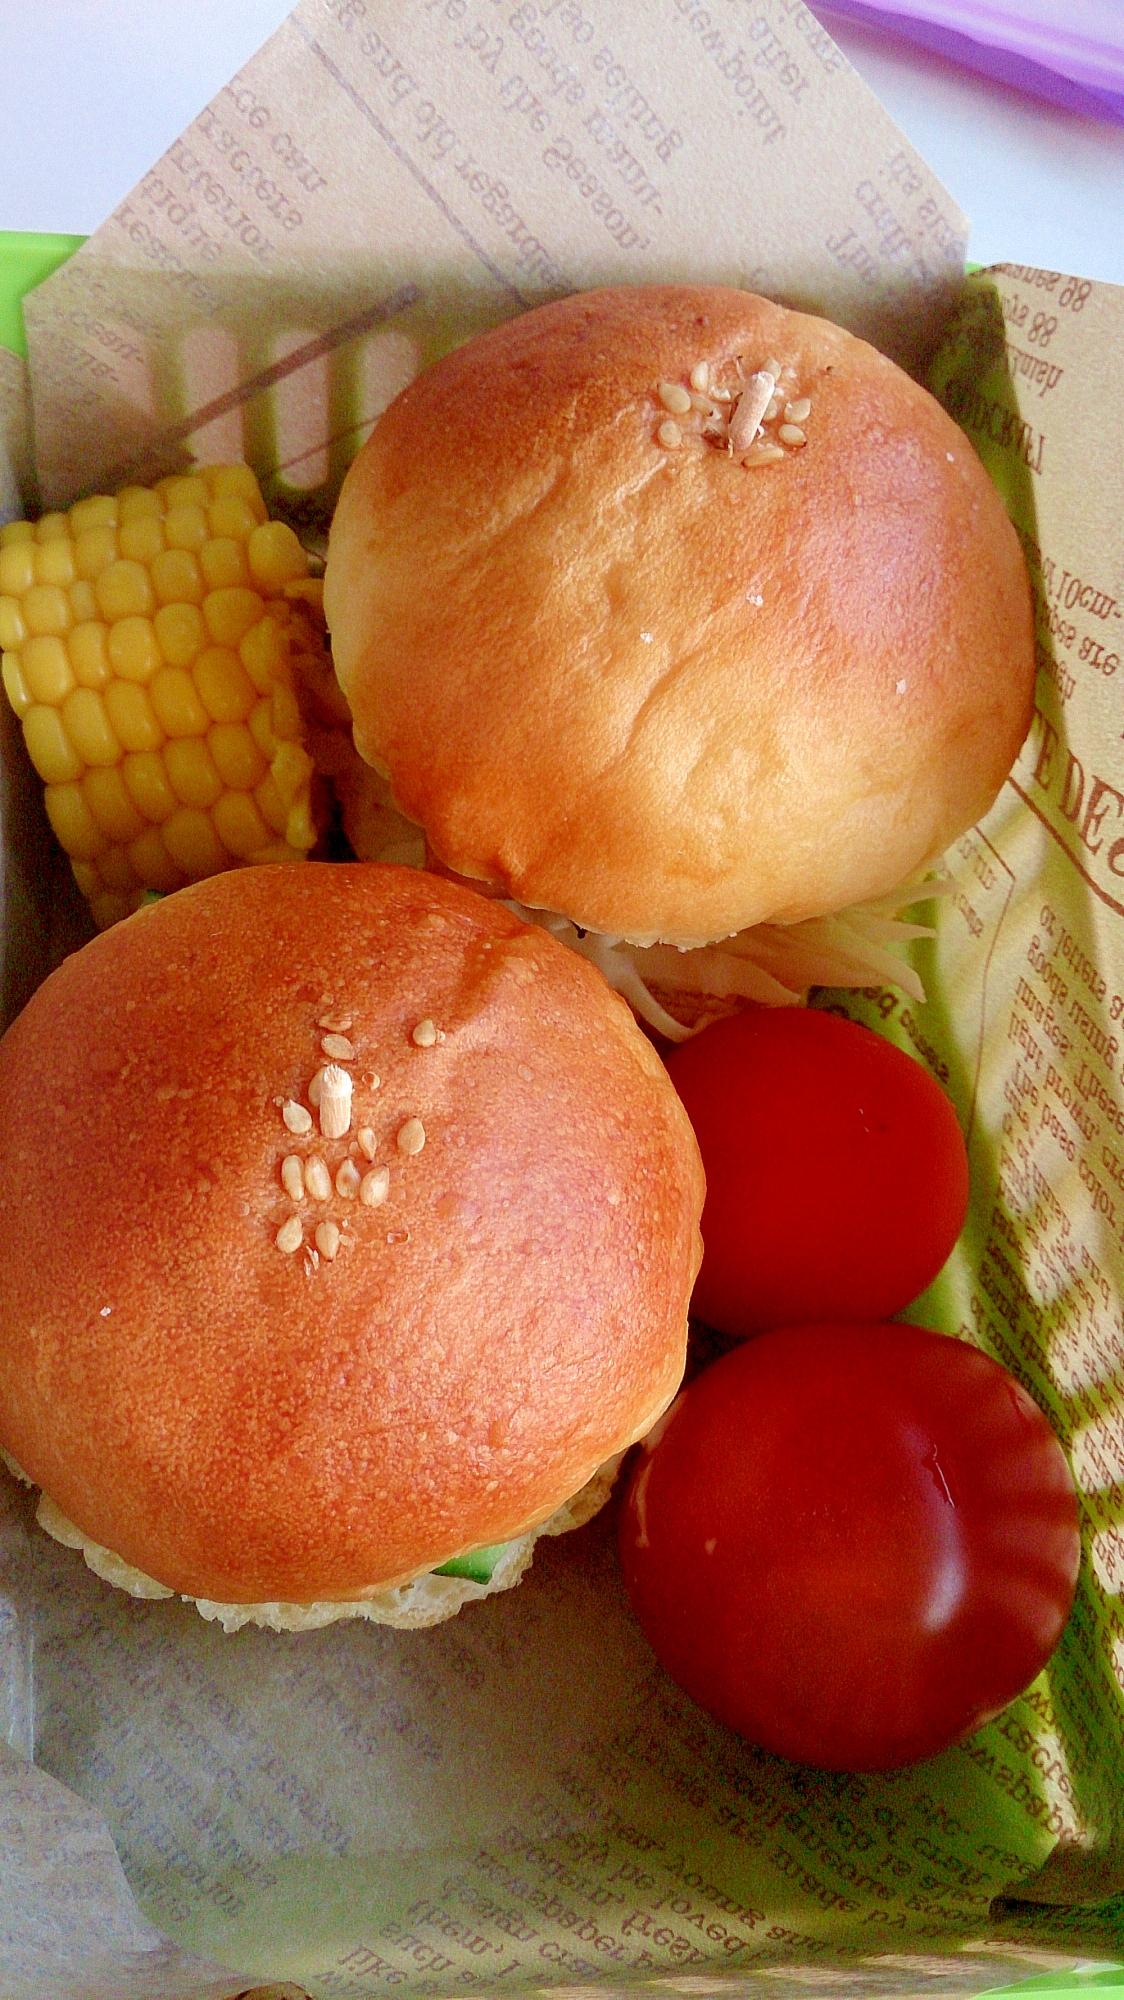 子供が喜ぶ♪ハンバーガー弁当